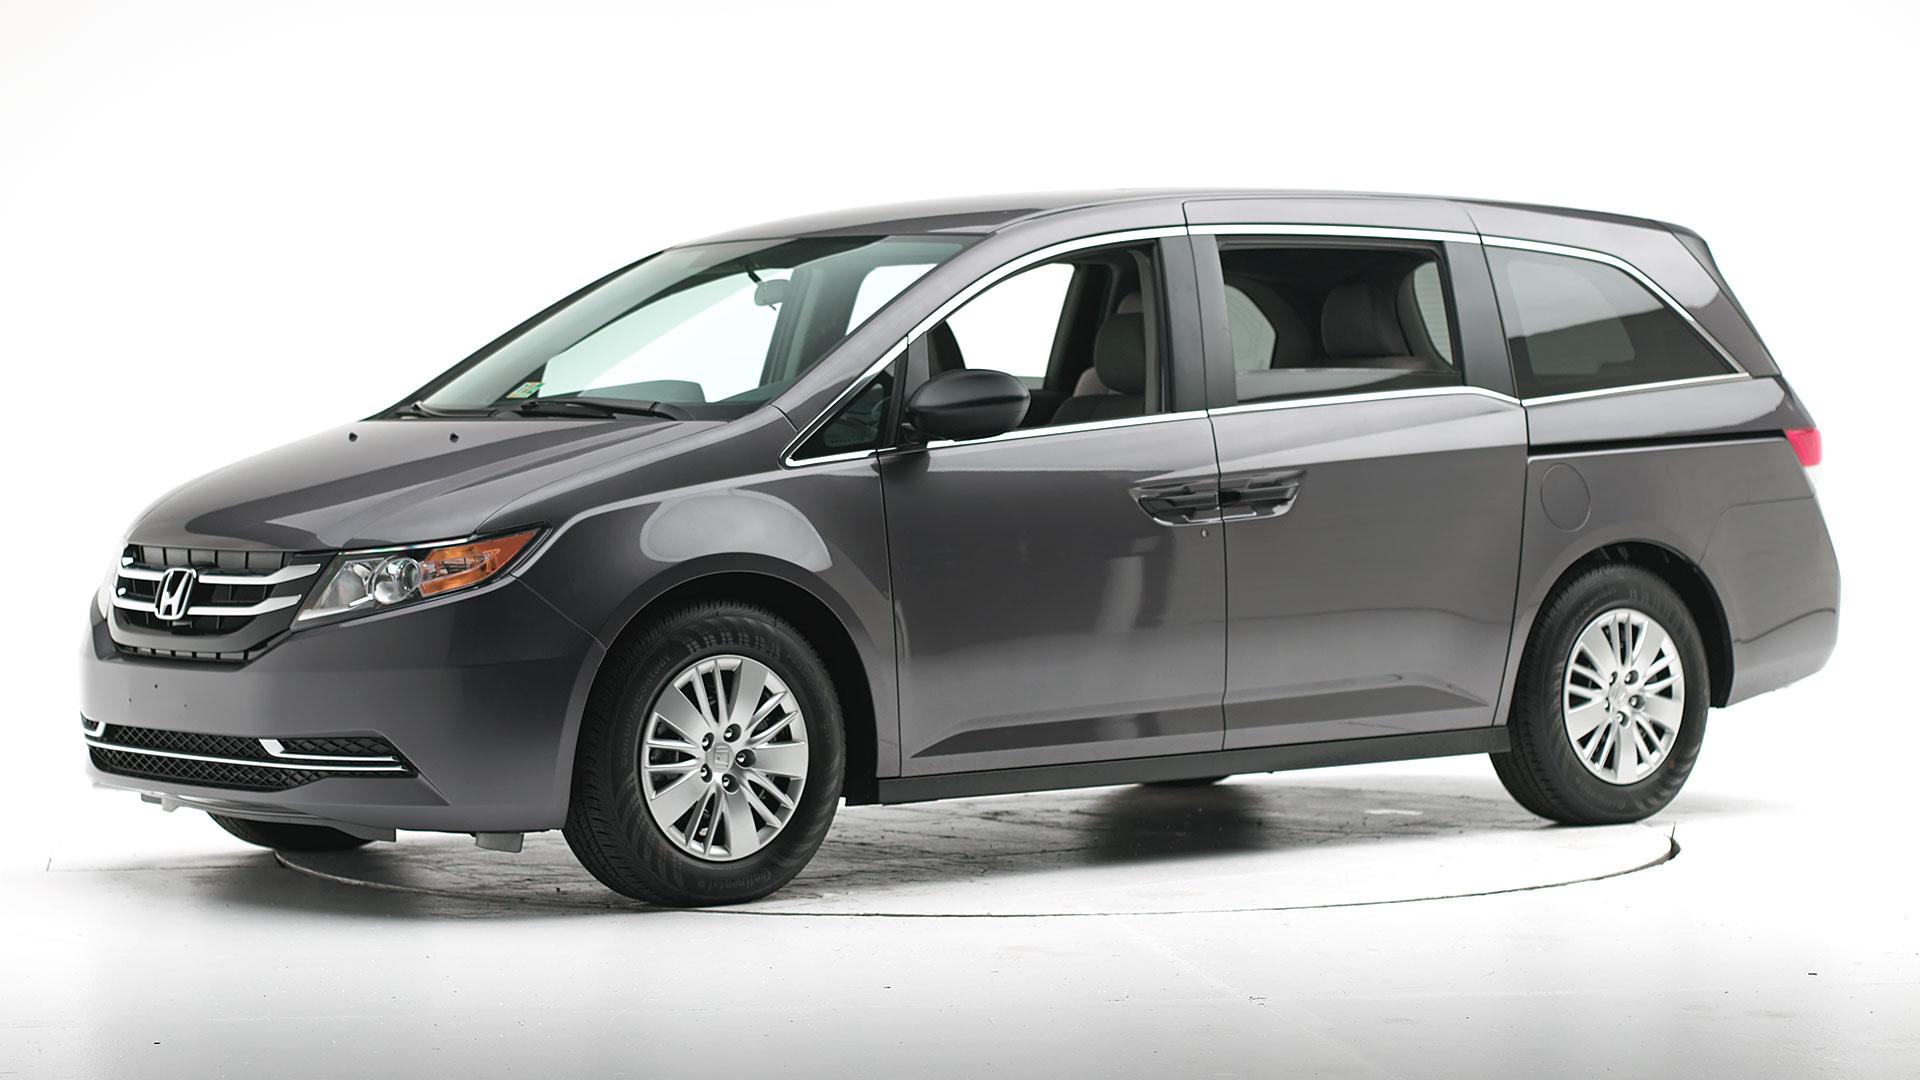 Kekurangan Honda Odyssey 2015 Top Model Tahun Ini